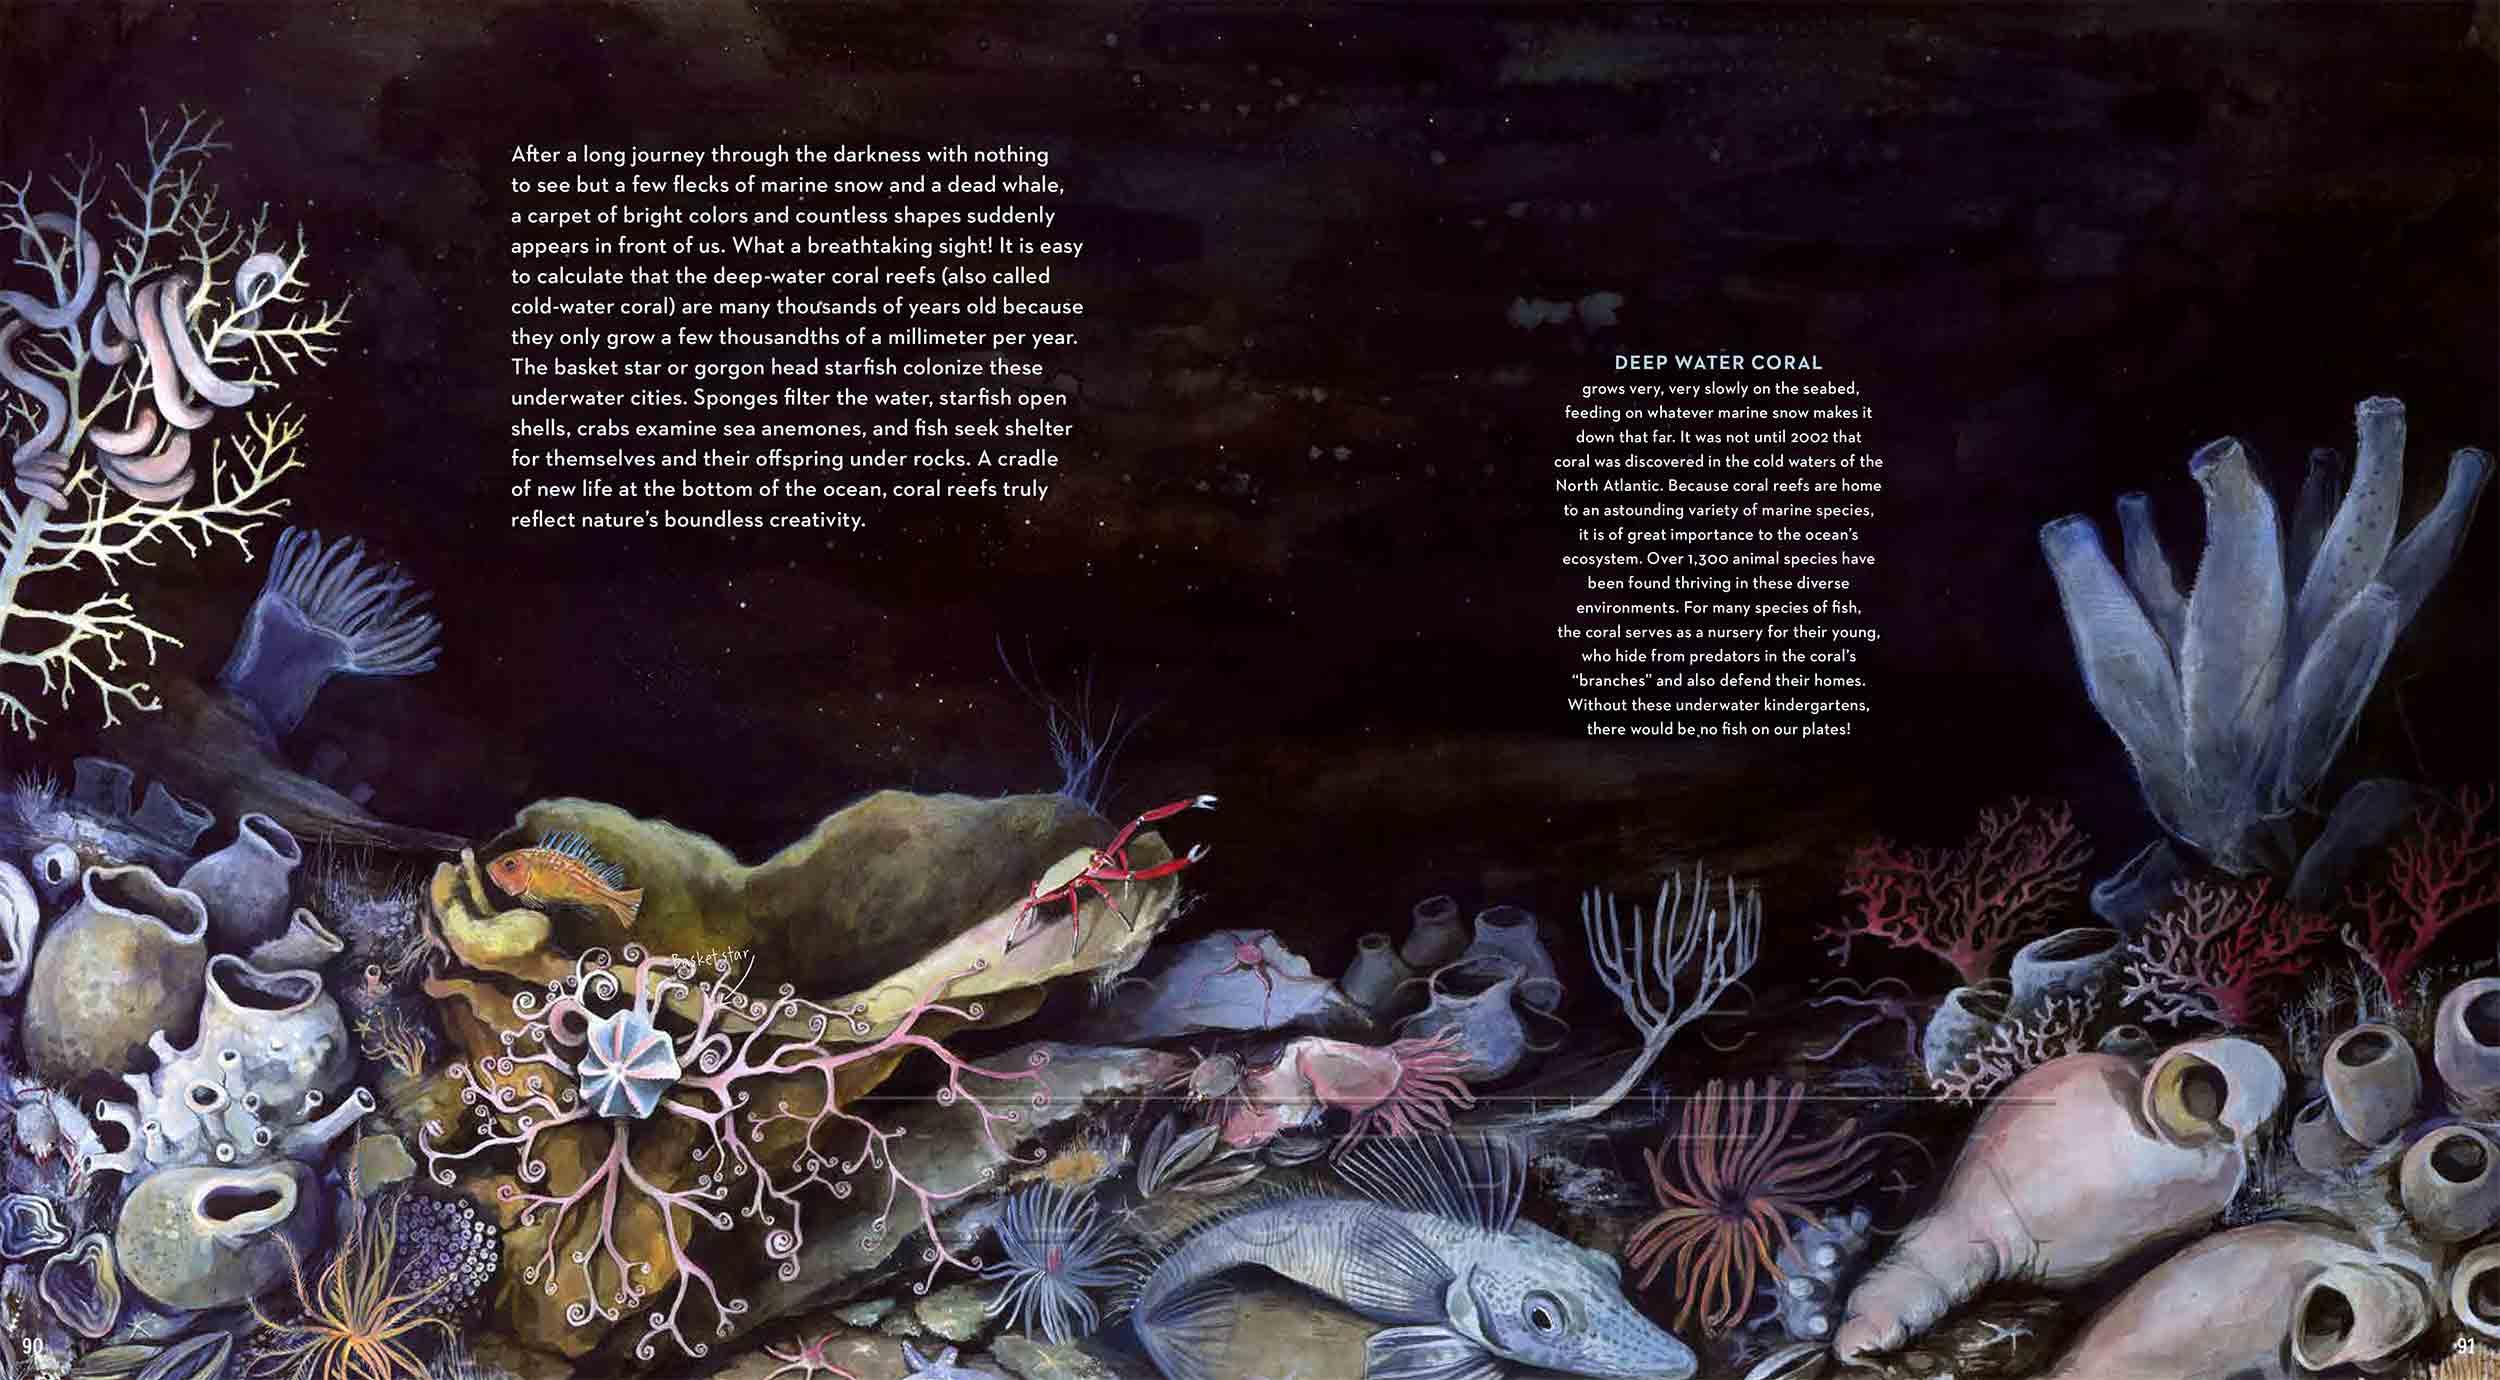 90-91-coralreef-seabed-deep-sea-Englisch-submersible-©annikasiems-plankton_deepsea-zooplankton.jpg